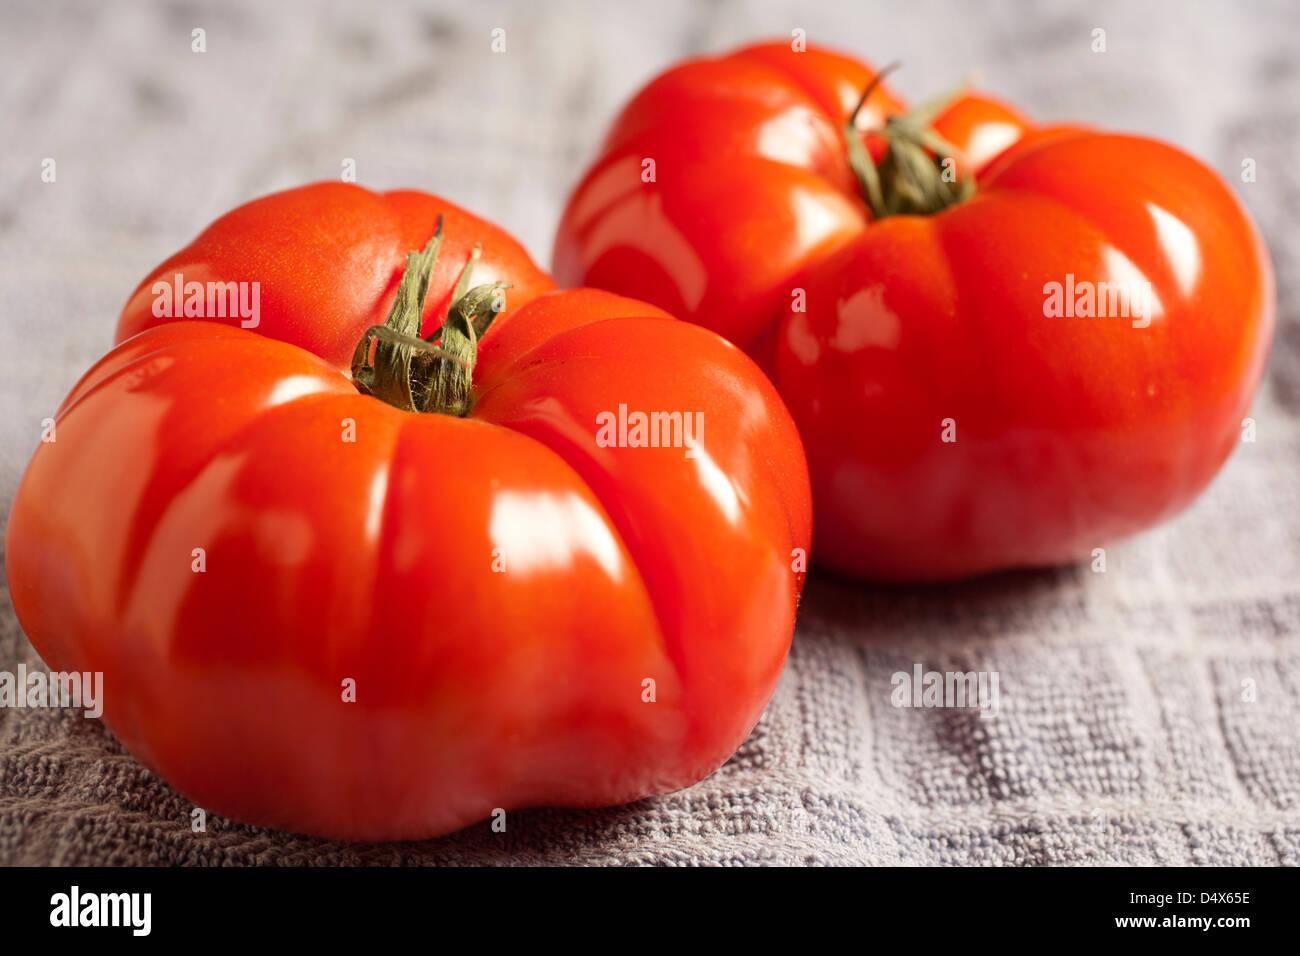 Beefsteak Tomatoes - Stock Image